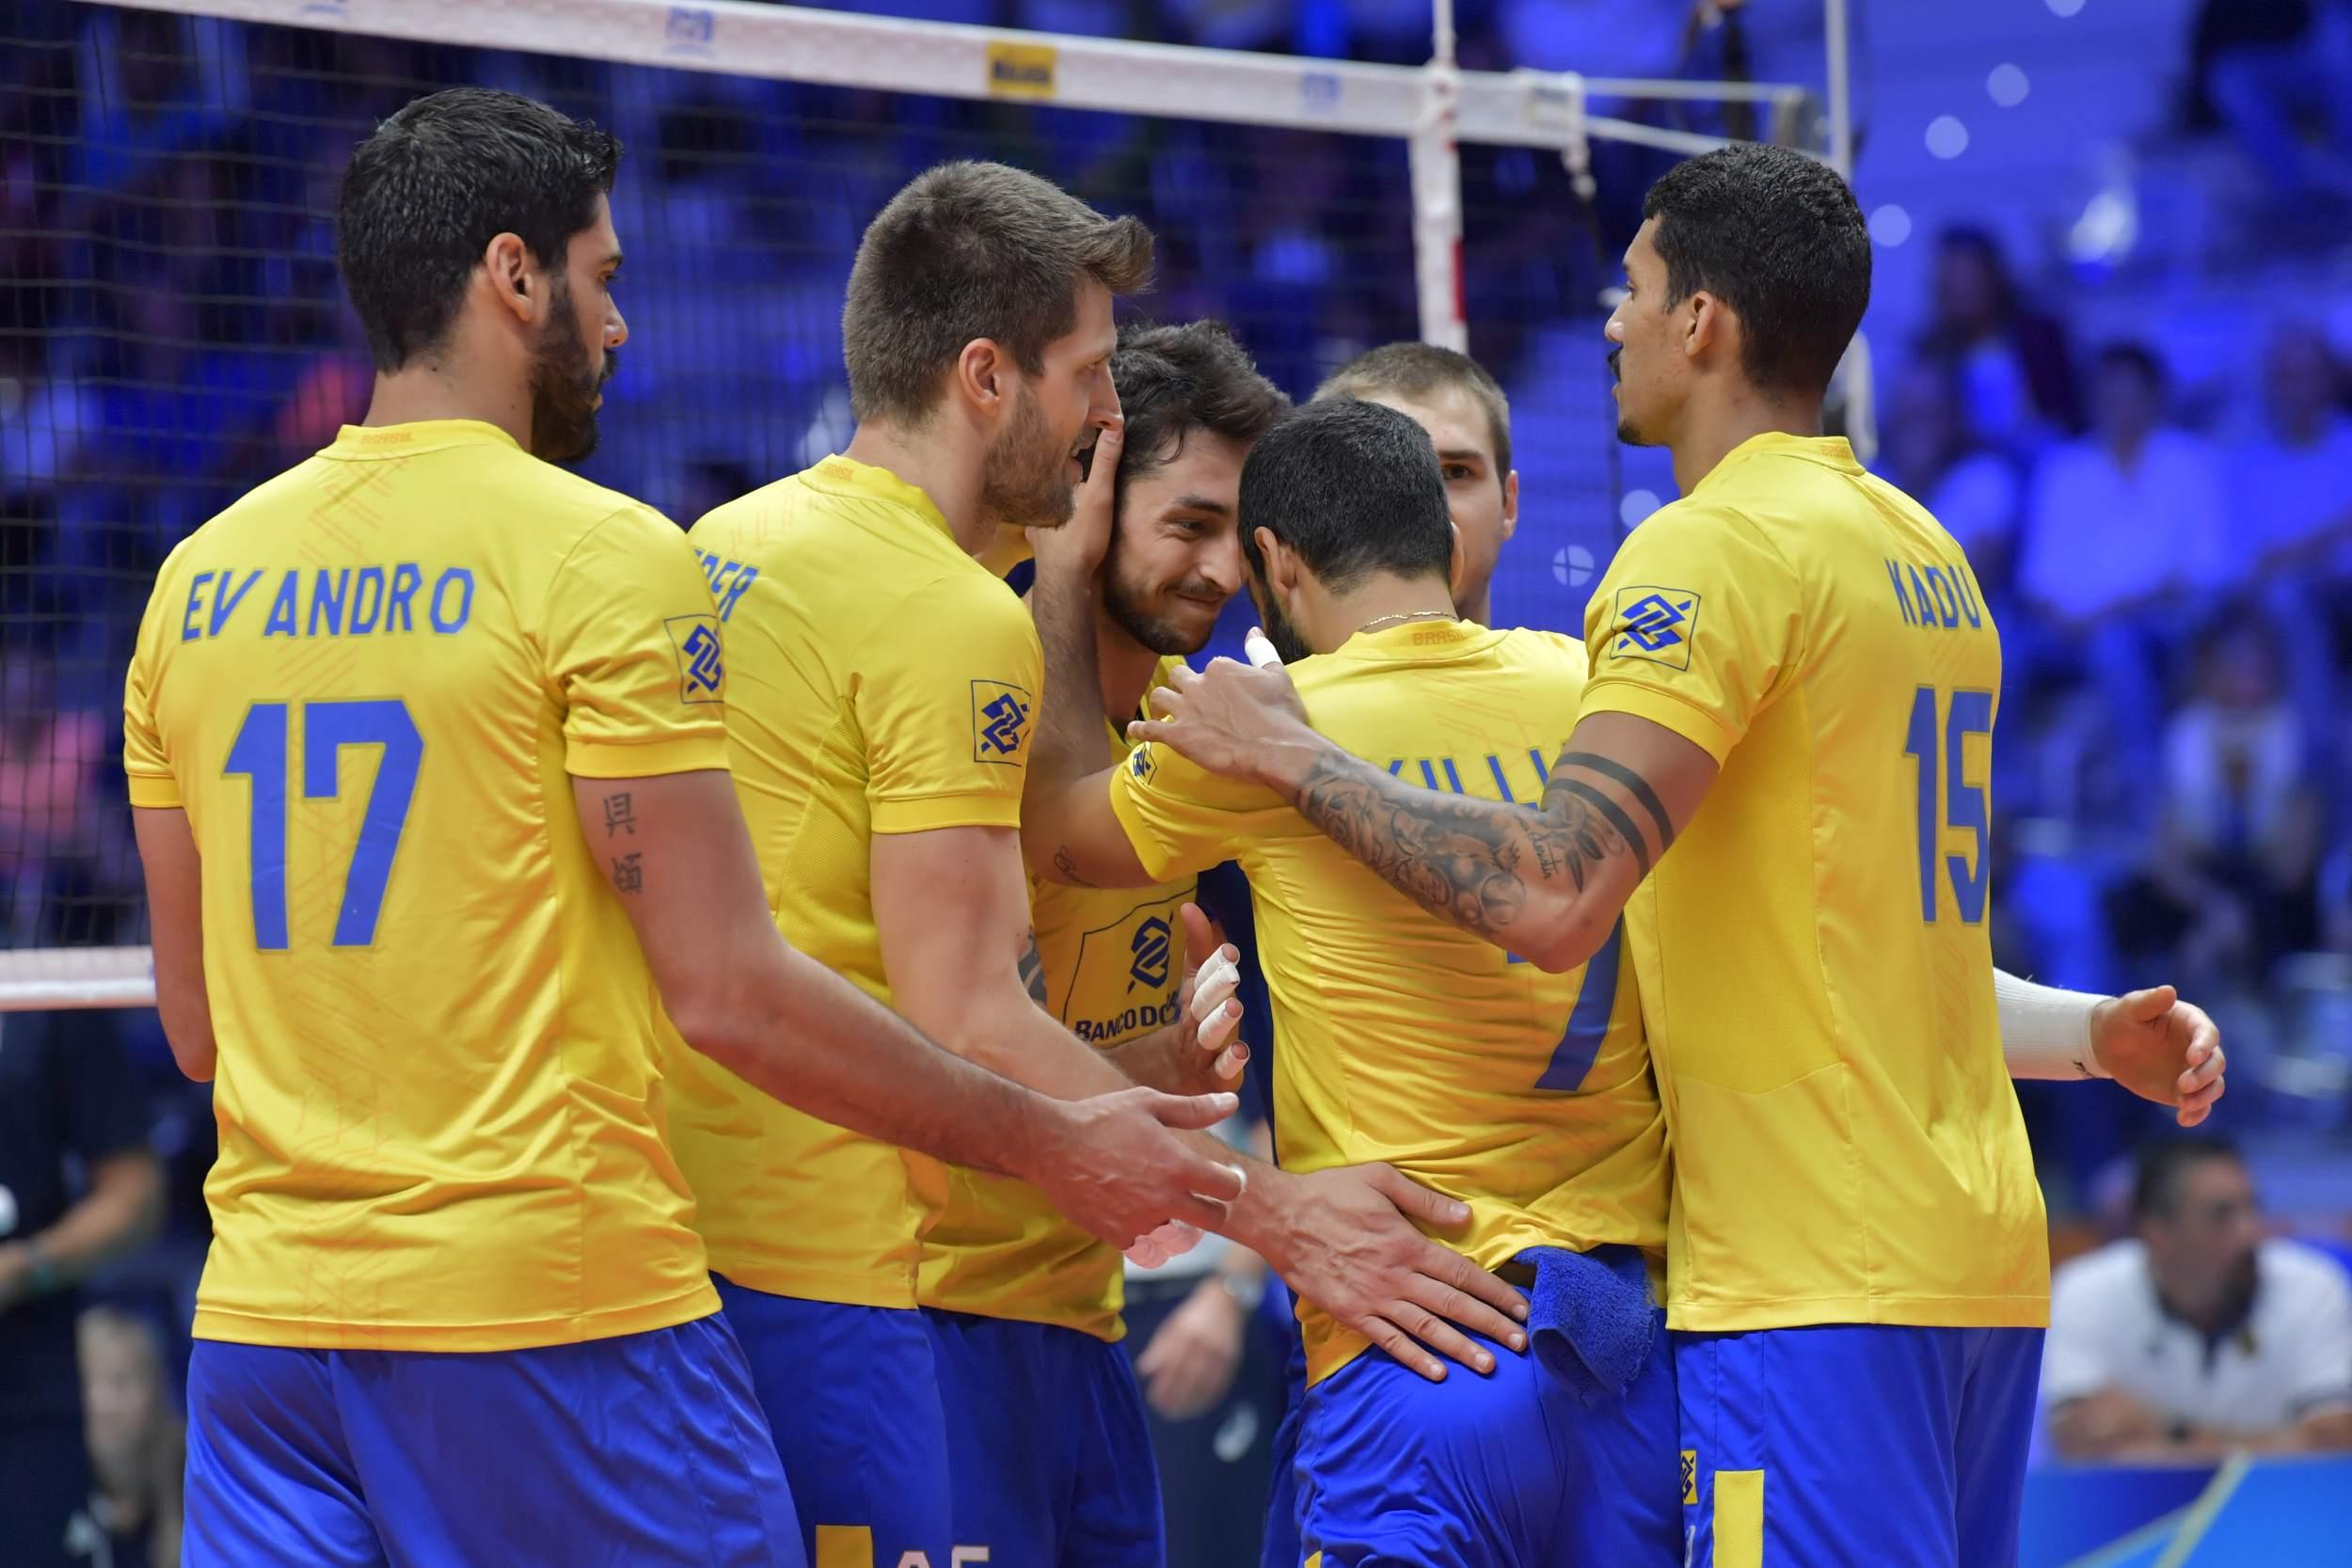 Brasil luta por título inédito nos dois naipes